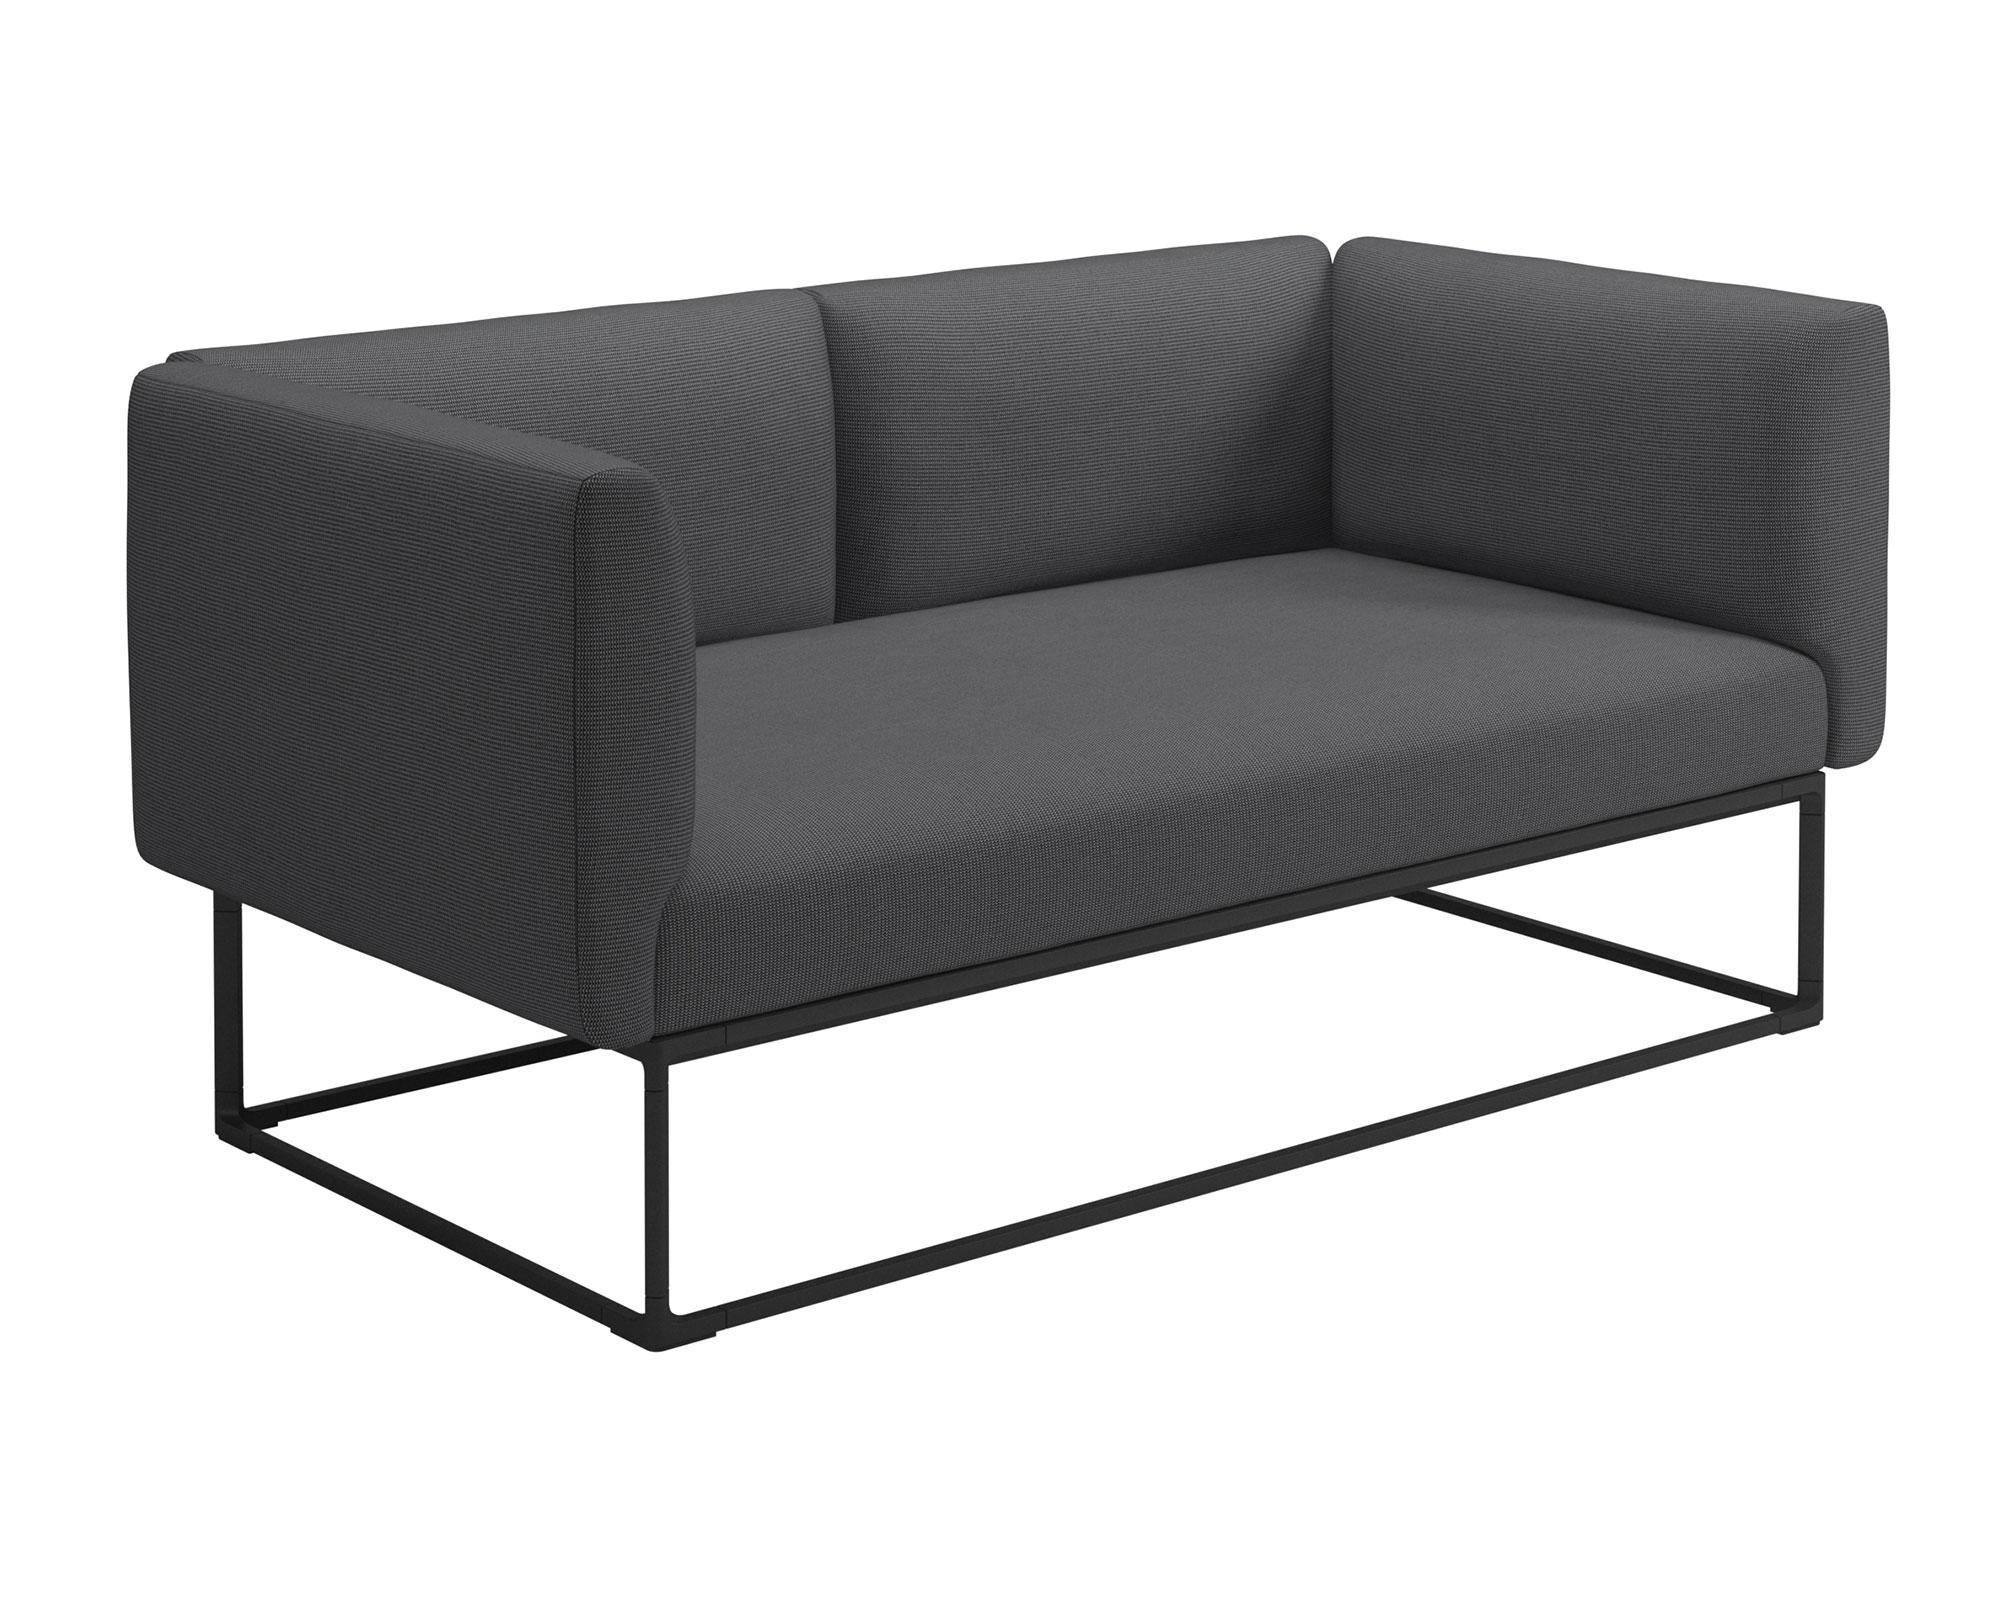 lounge sofa maya gloster. Black Bedroom Furniture Sets. Home Design Ideas